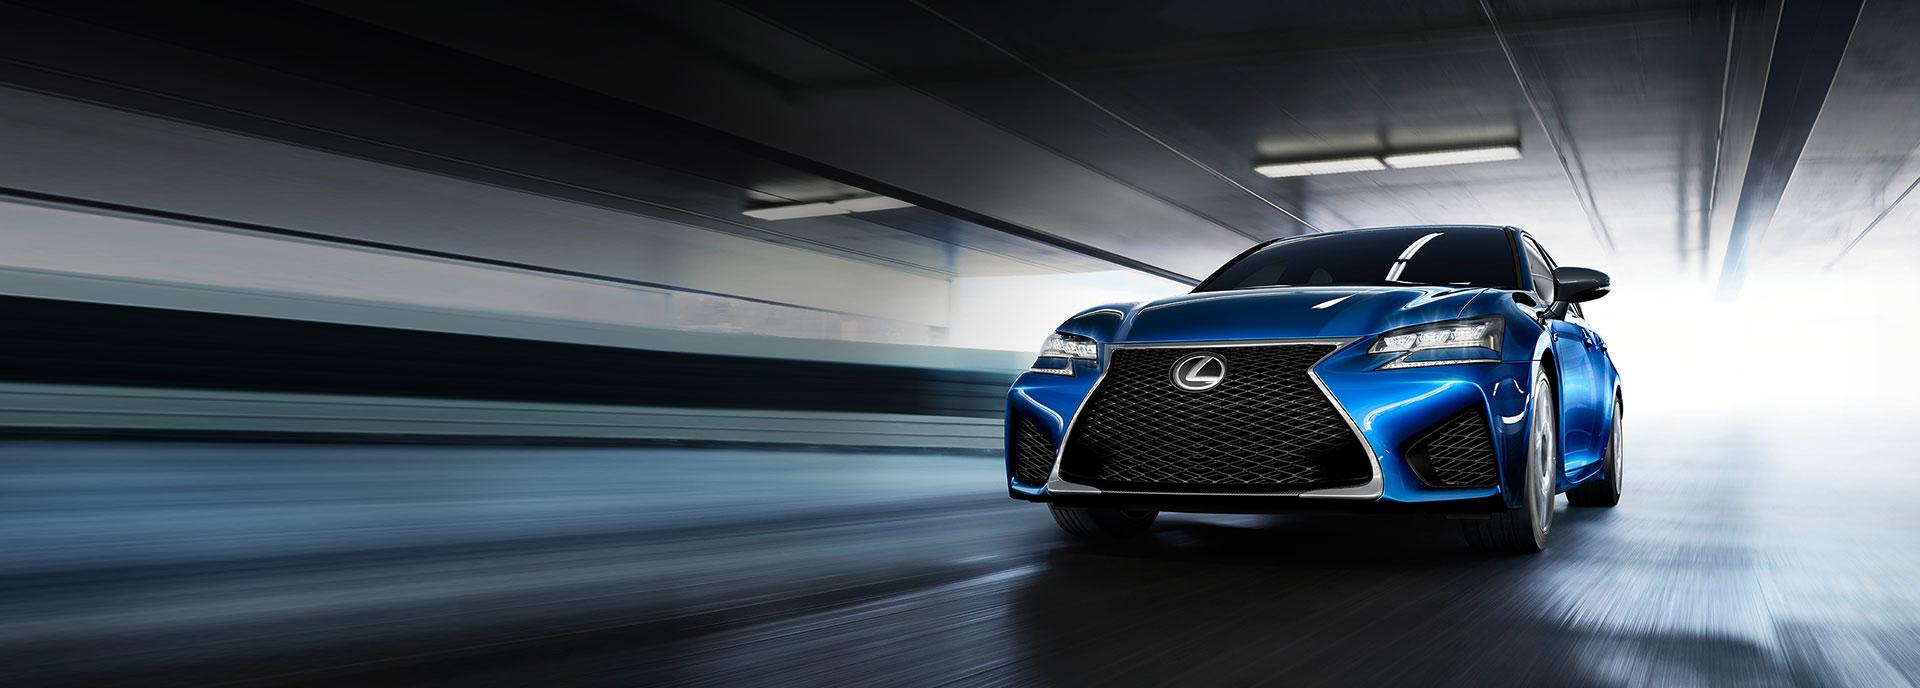 Lexus GSF velocidad